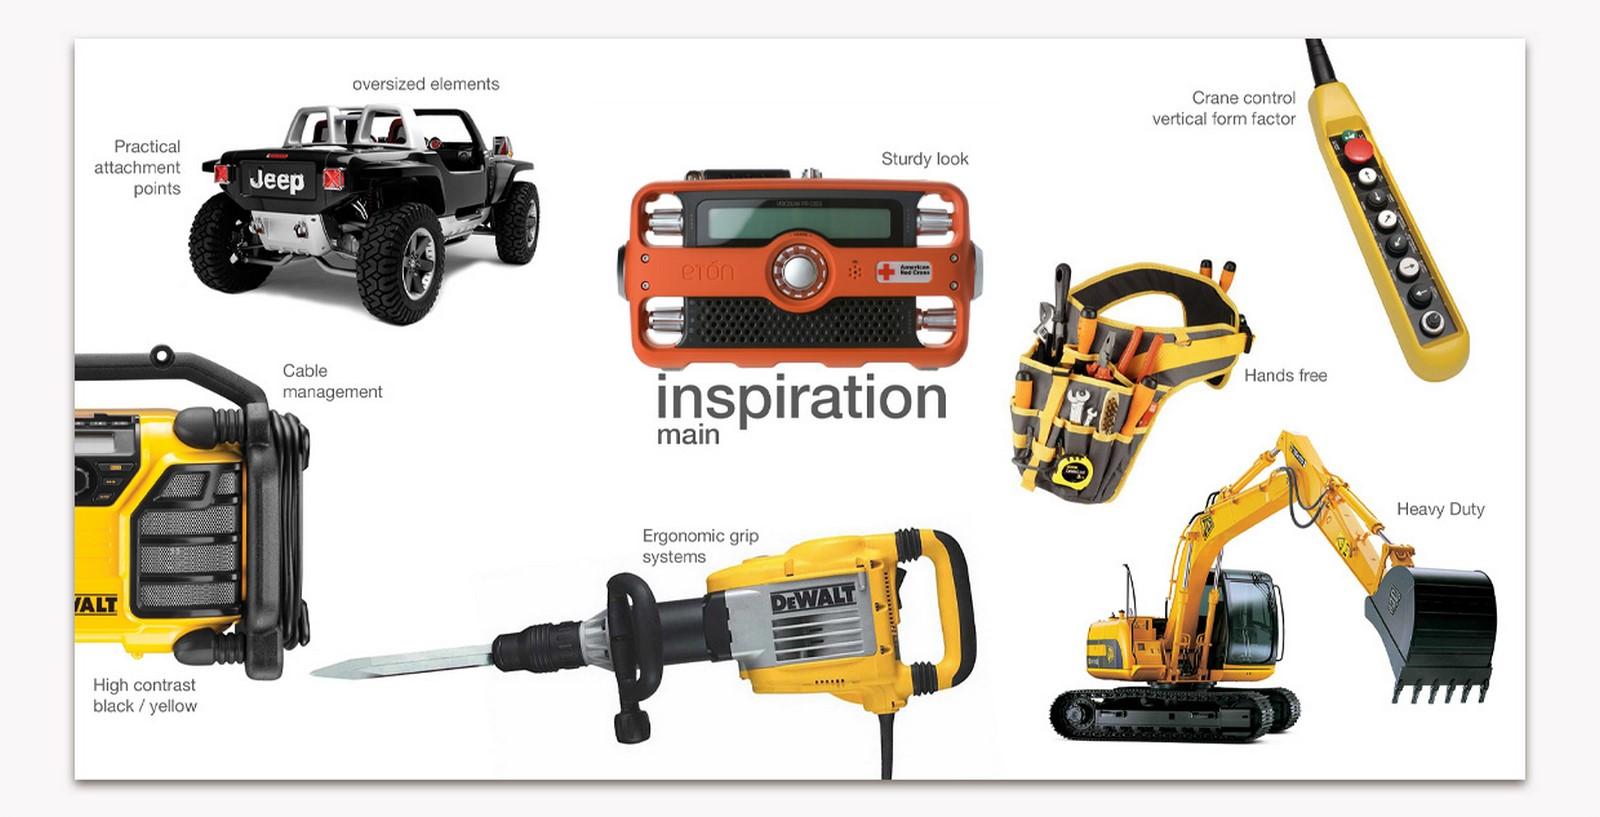 Sequoia-studio- 10 Iconic Products - Sheet28